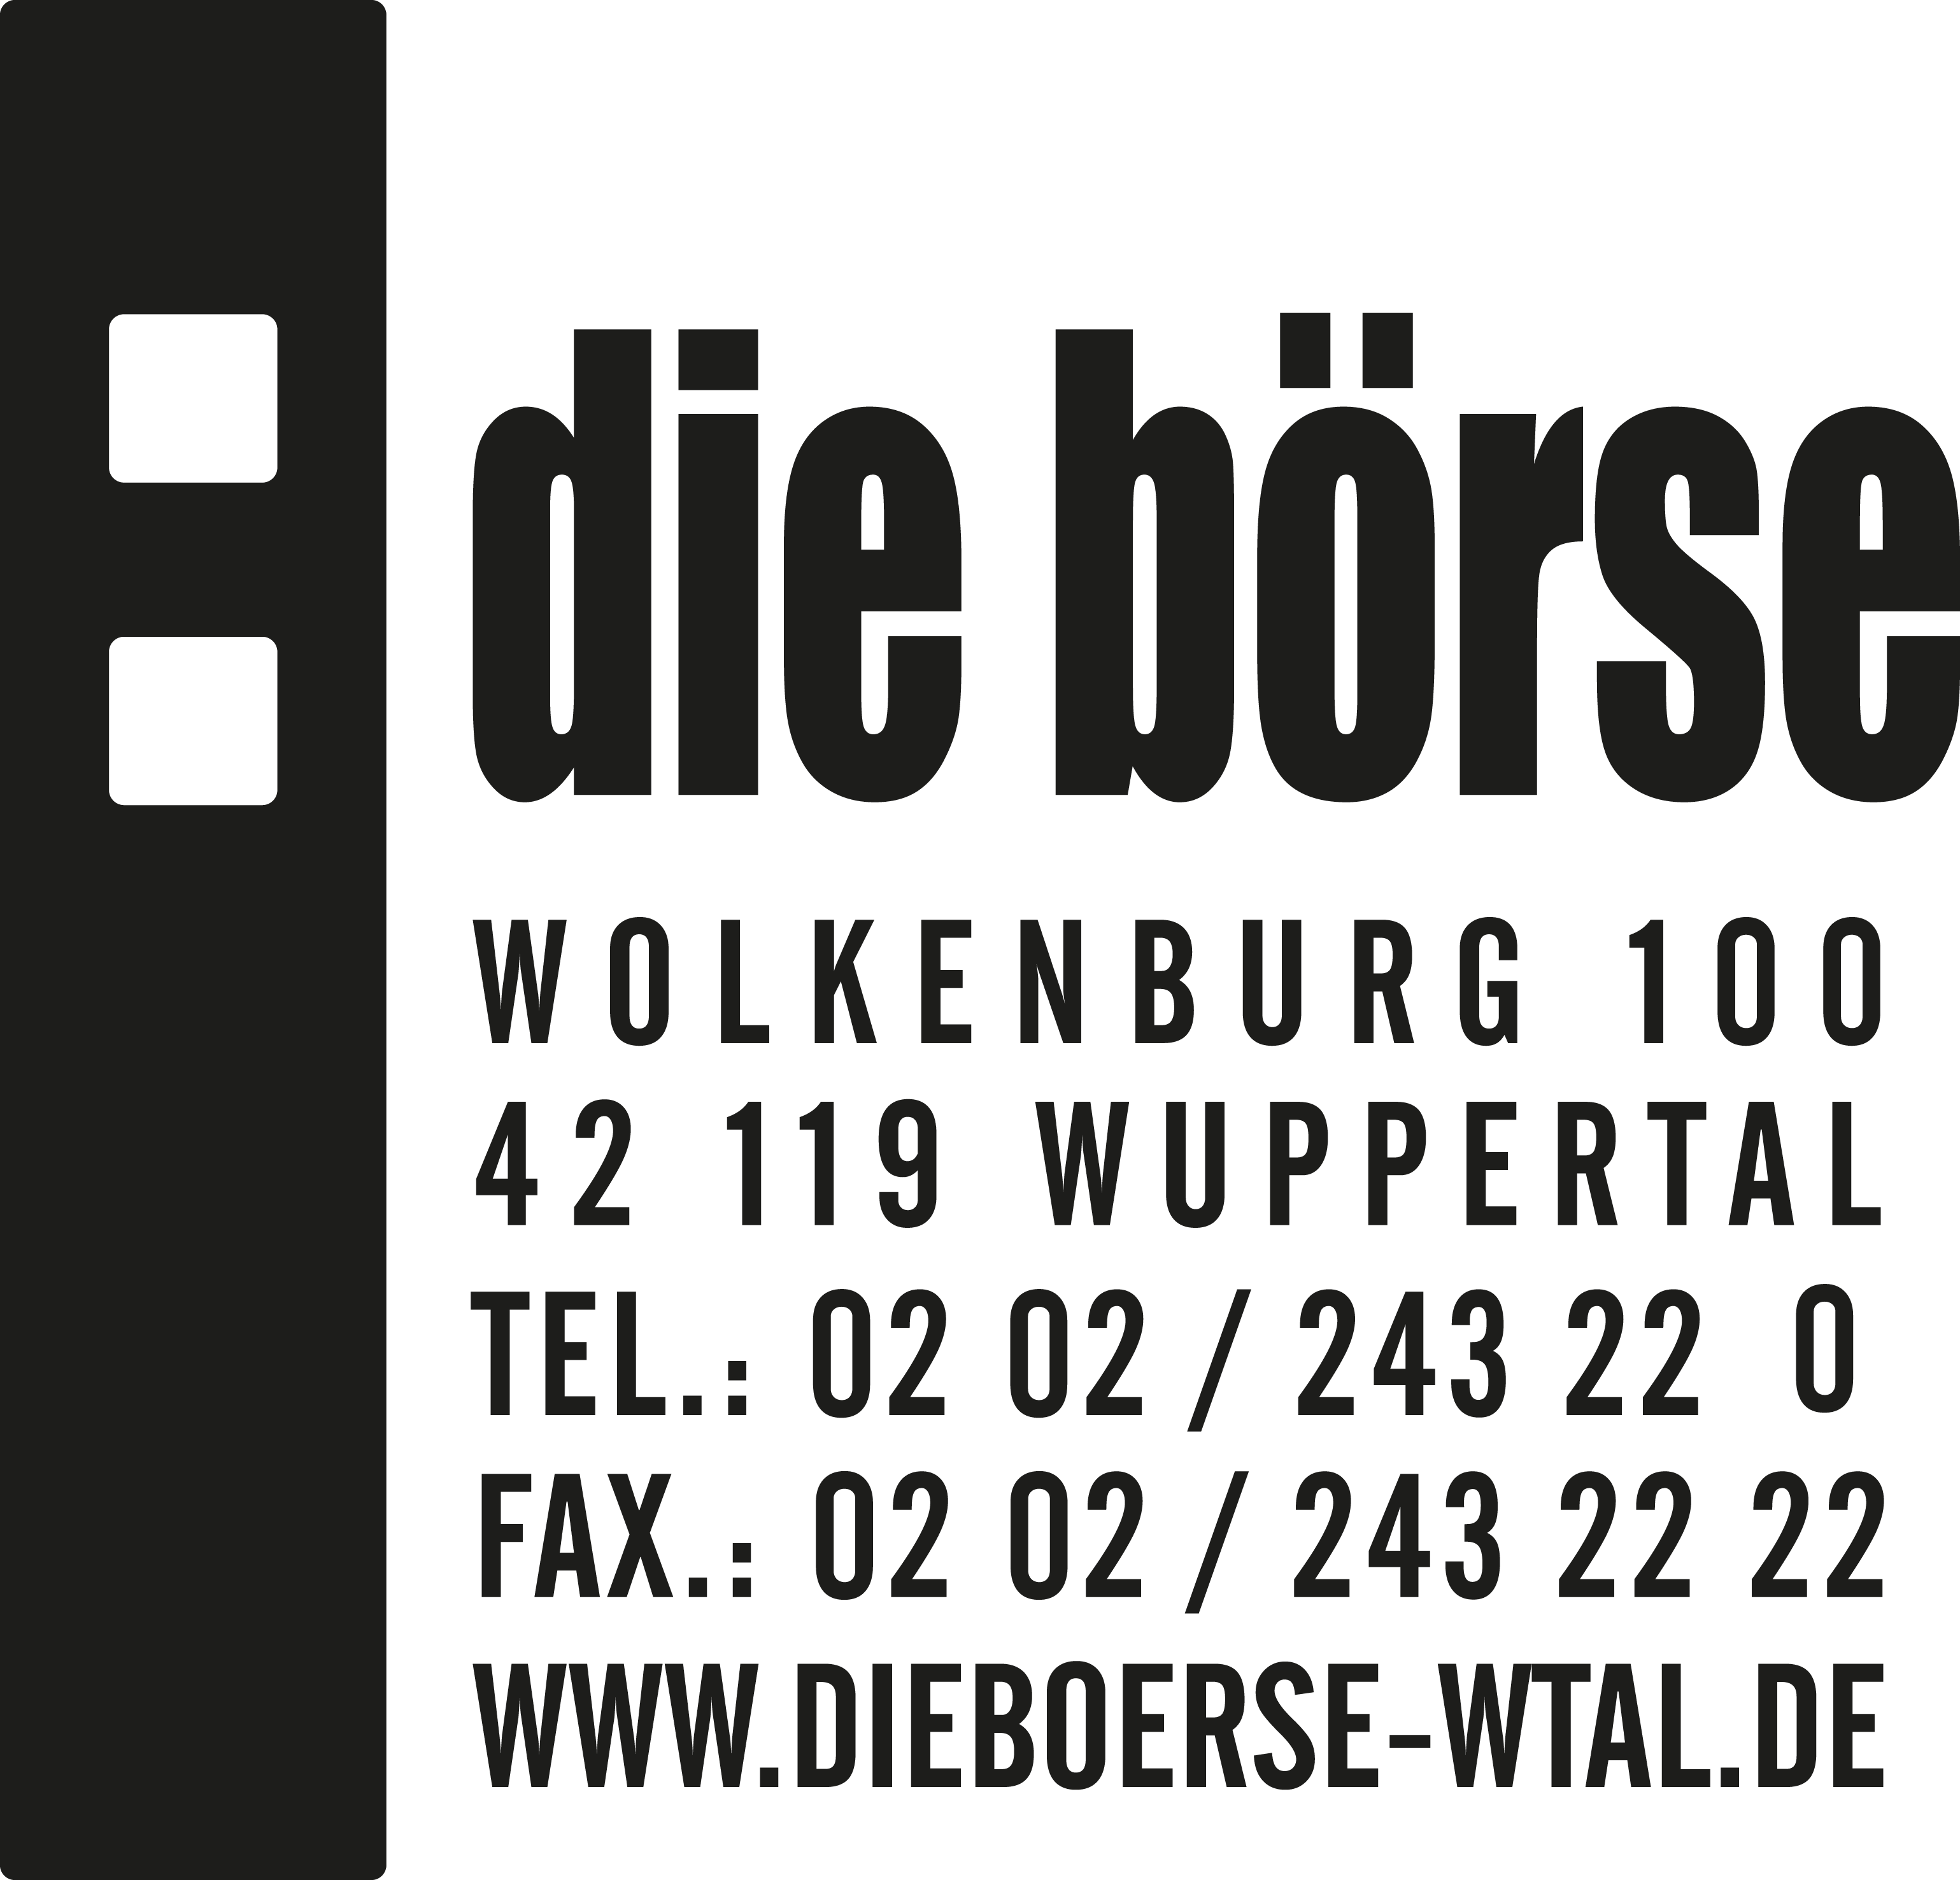 logo boerse hochkant schwarz